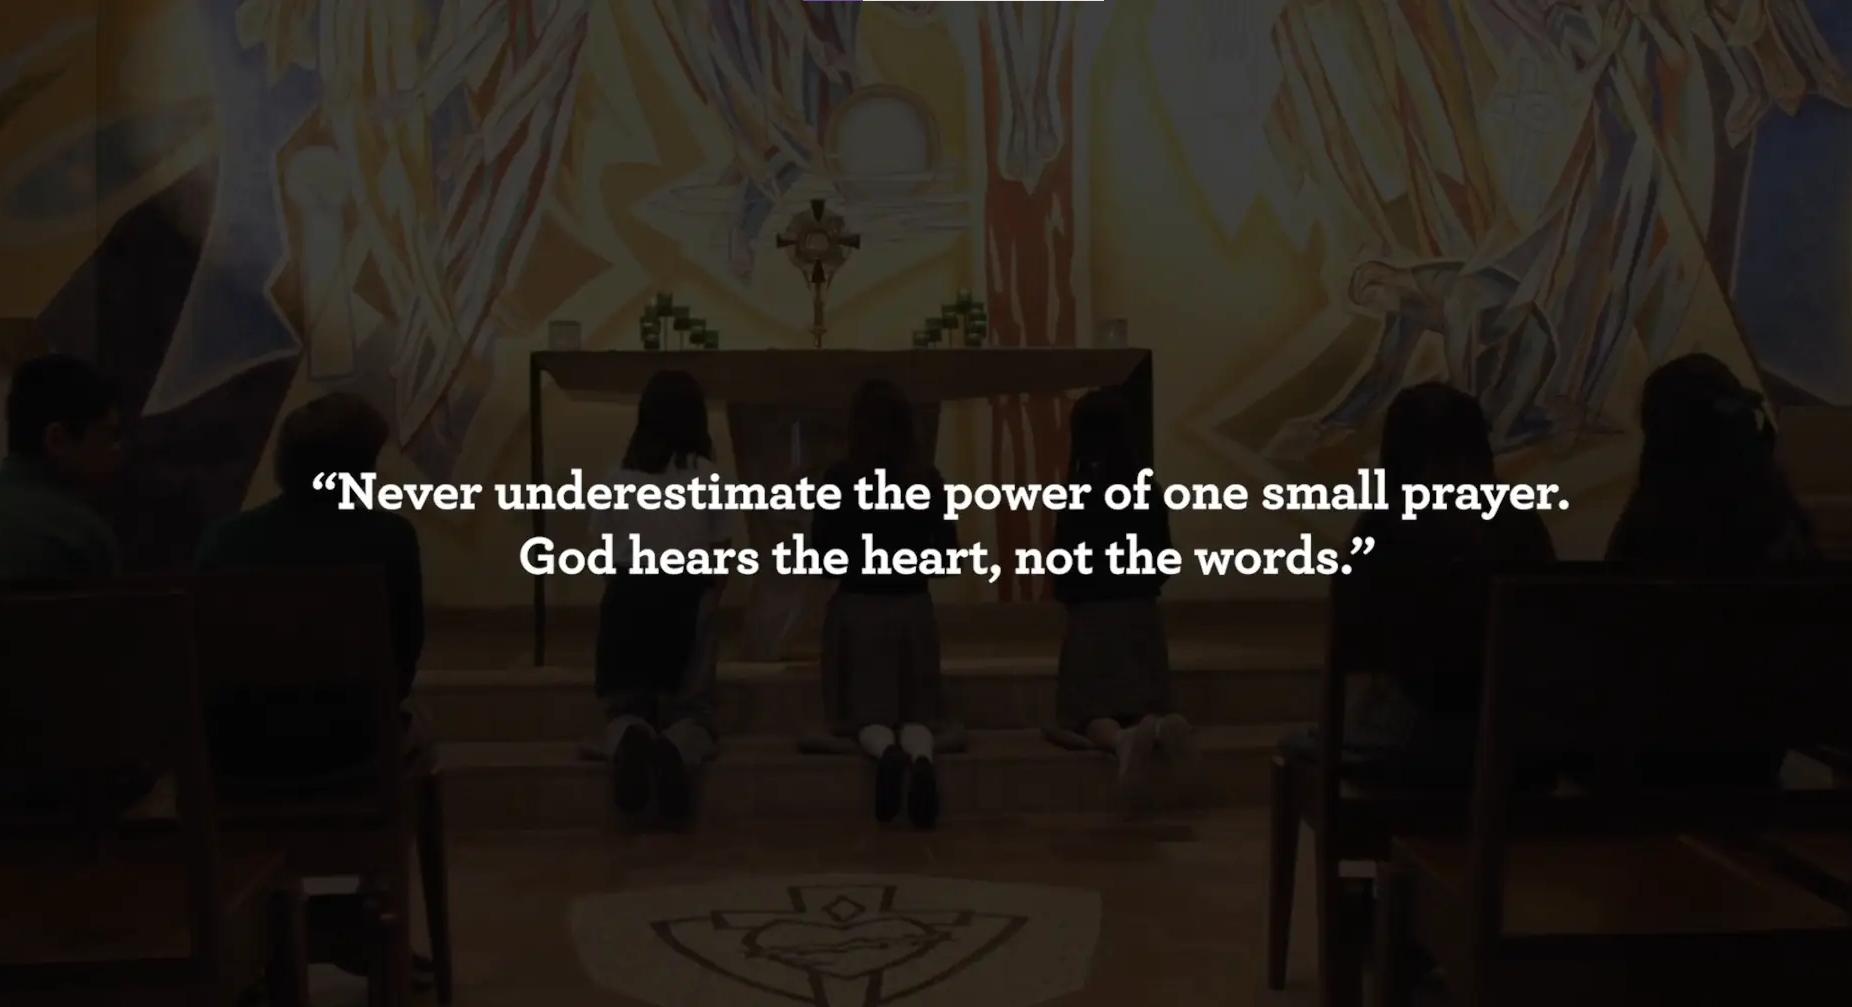 https://sacredheartsisters.com/wp-content/uploads/2021/04/Power-of-prayer.png